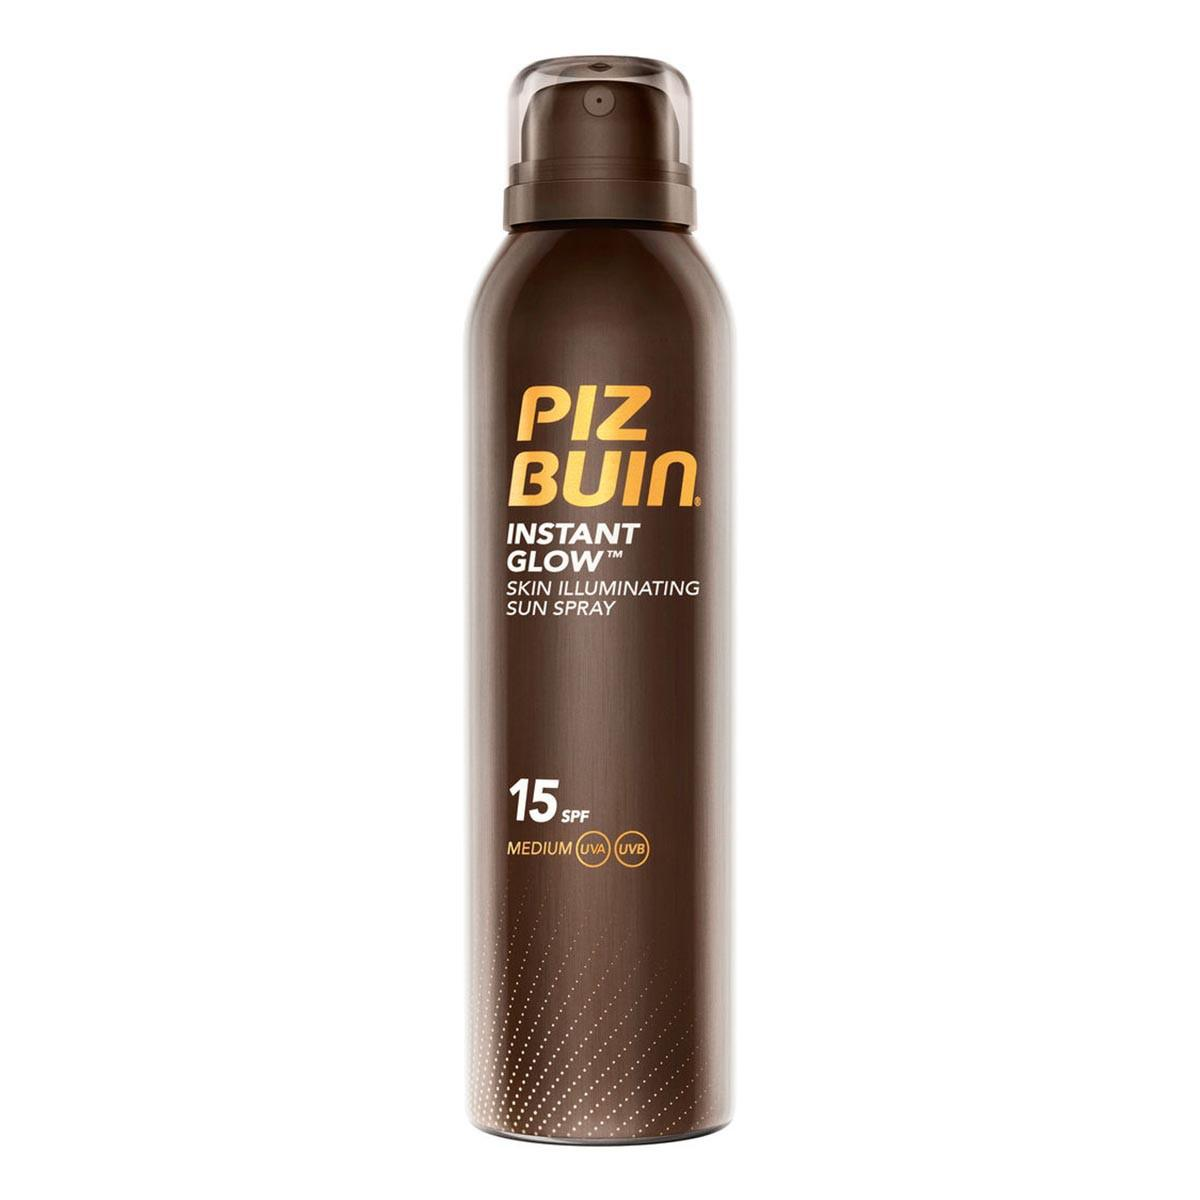 Piz-buin-fragrances Instant Glow Skin Illuminating Sun Spray Spf15 150ml